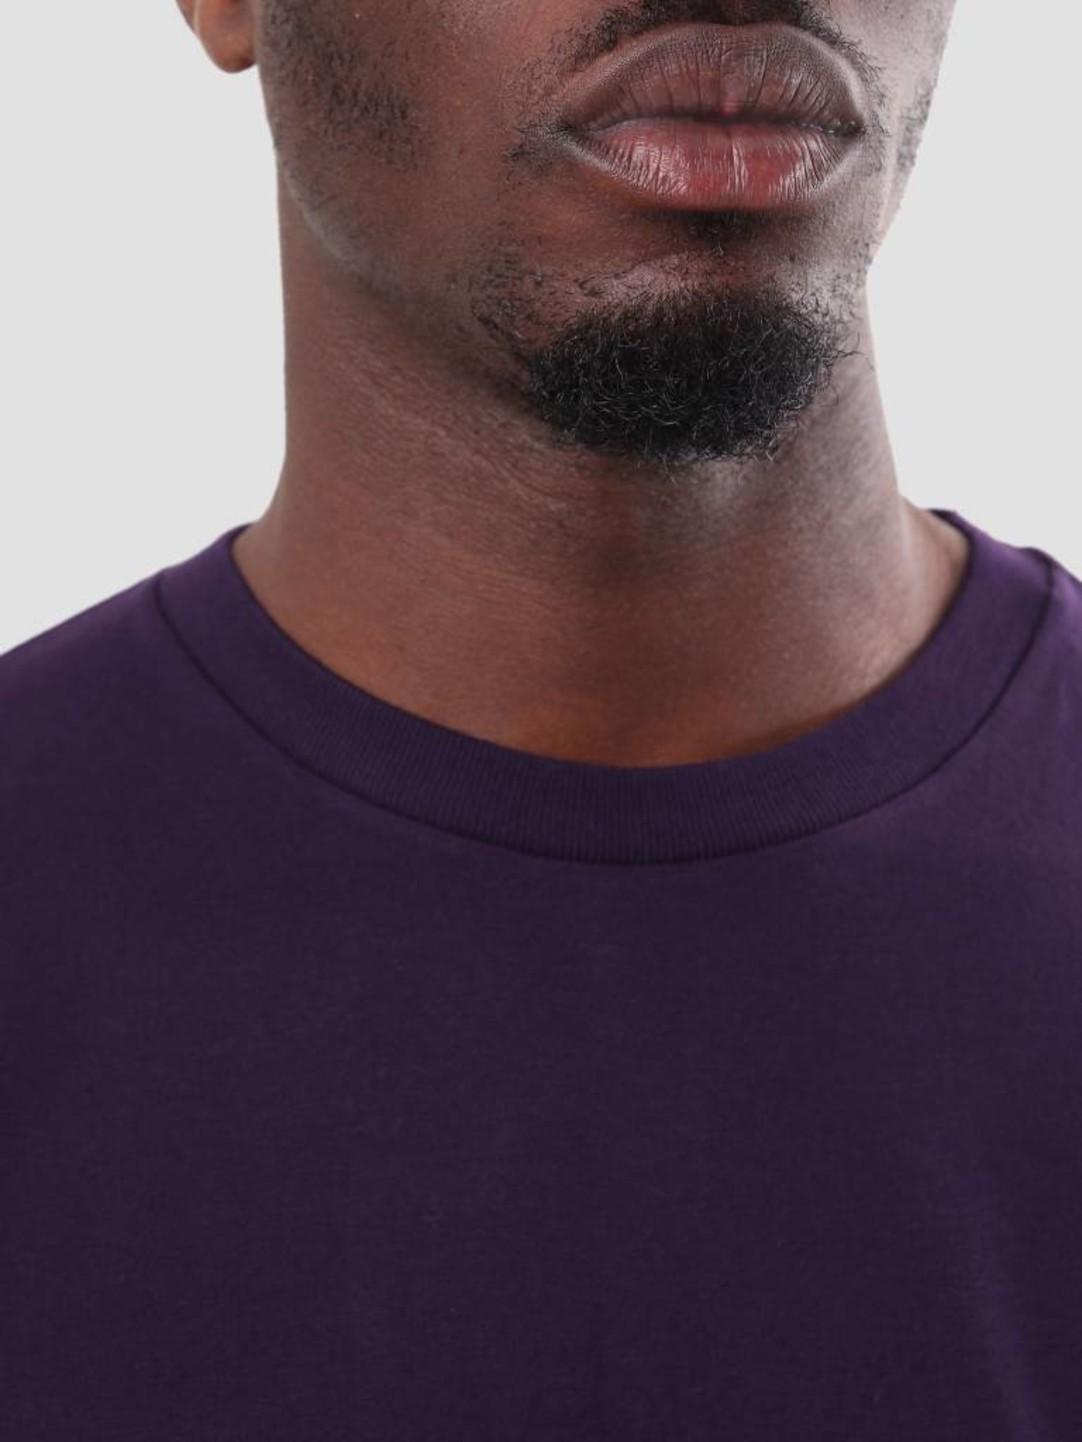 Carhartt WIP Carhartt WIP Chase Longsleeve Lakers Gold I026392-88990